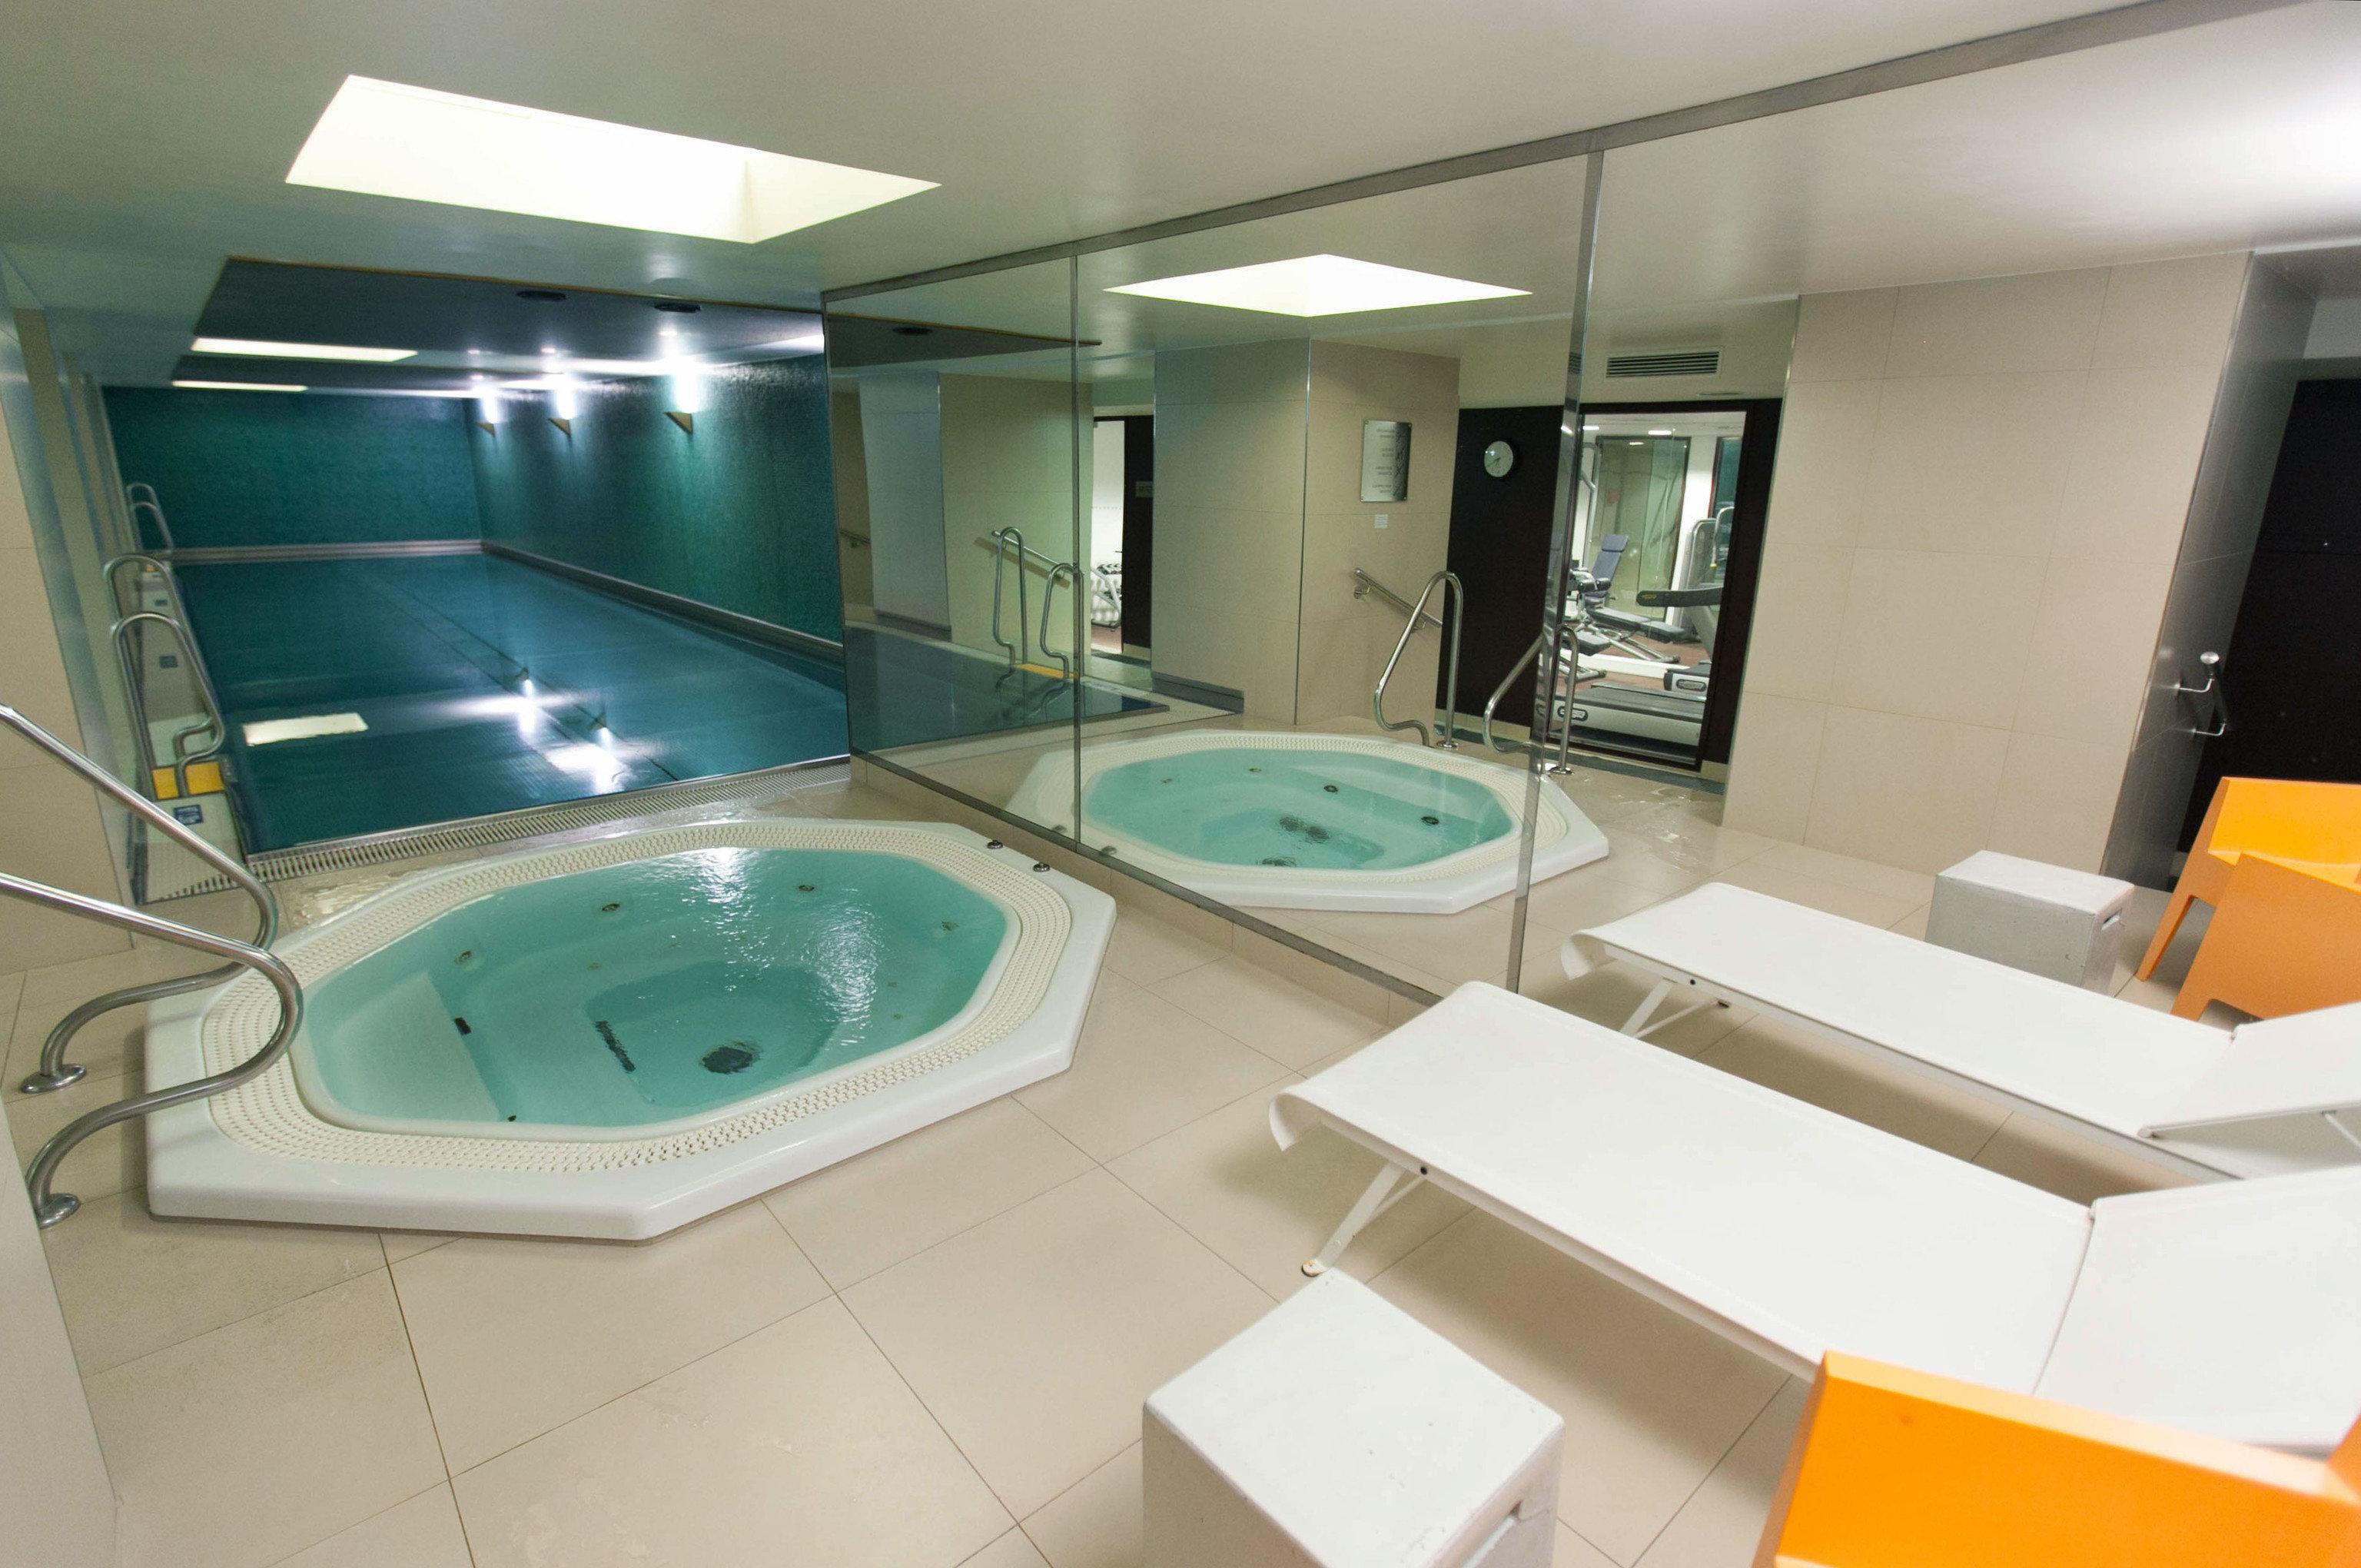 swimming pool property bathtub jacuzzi Suite